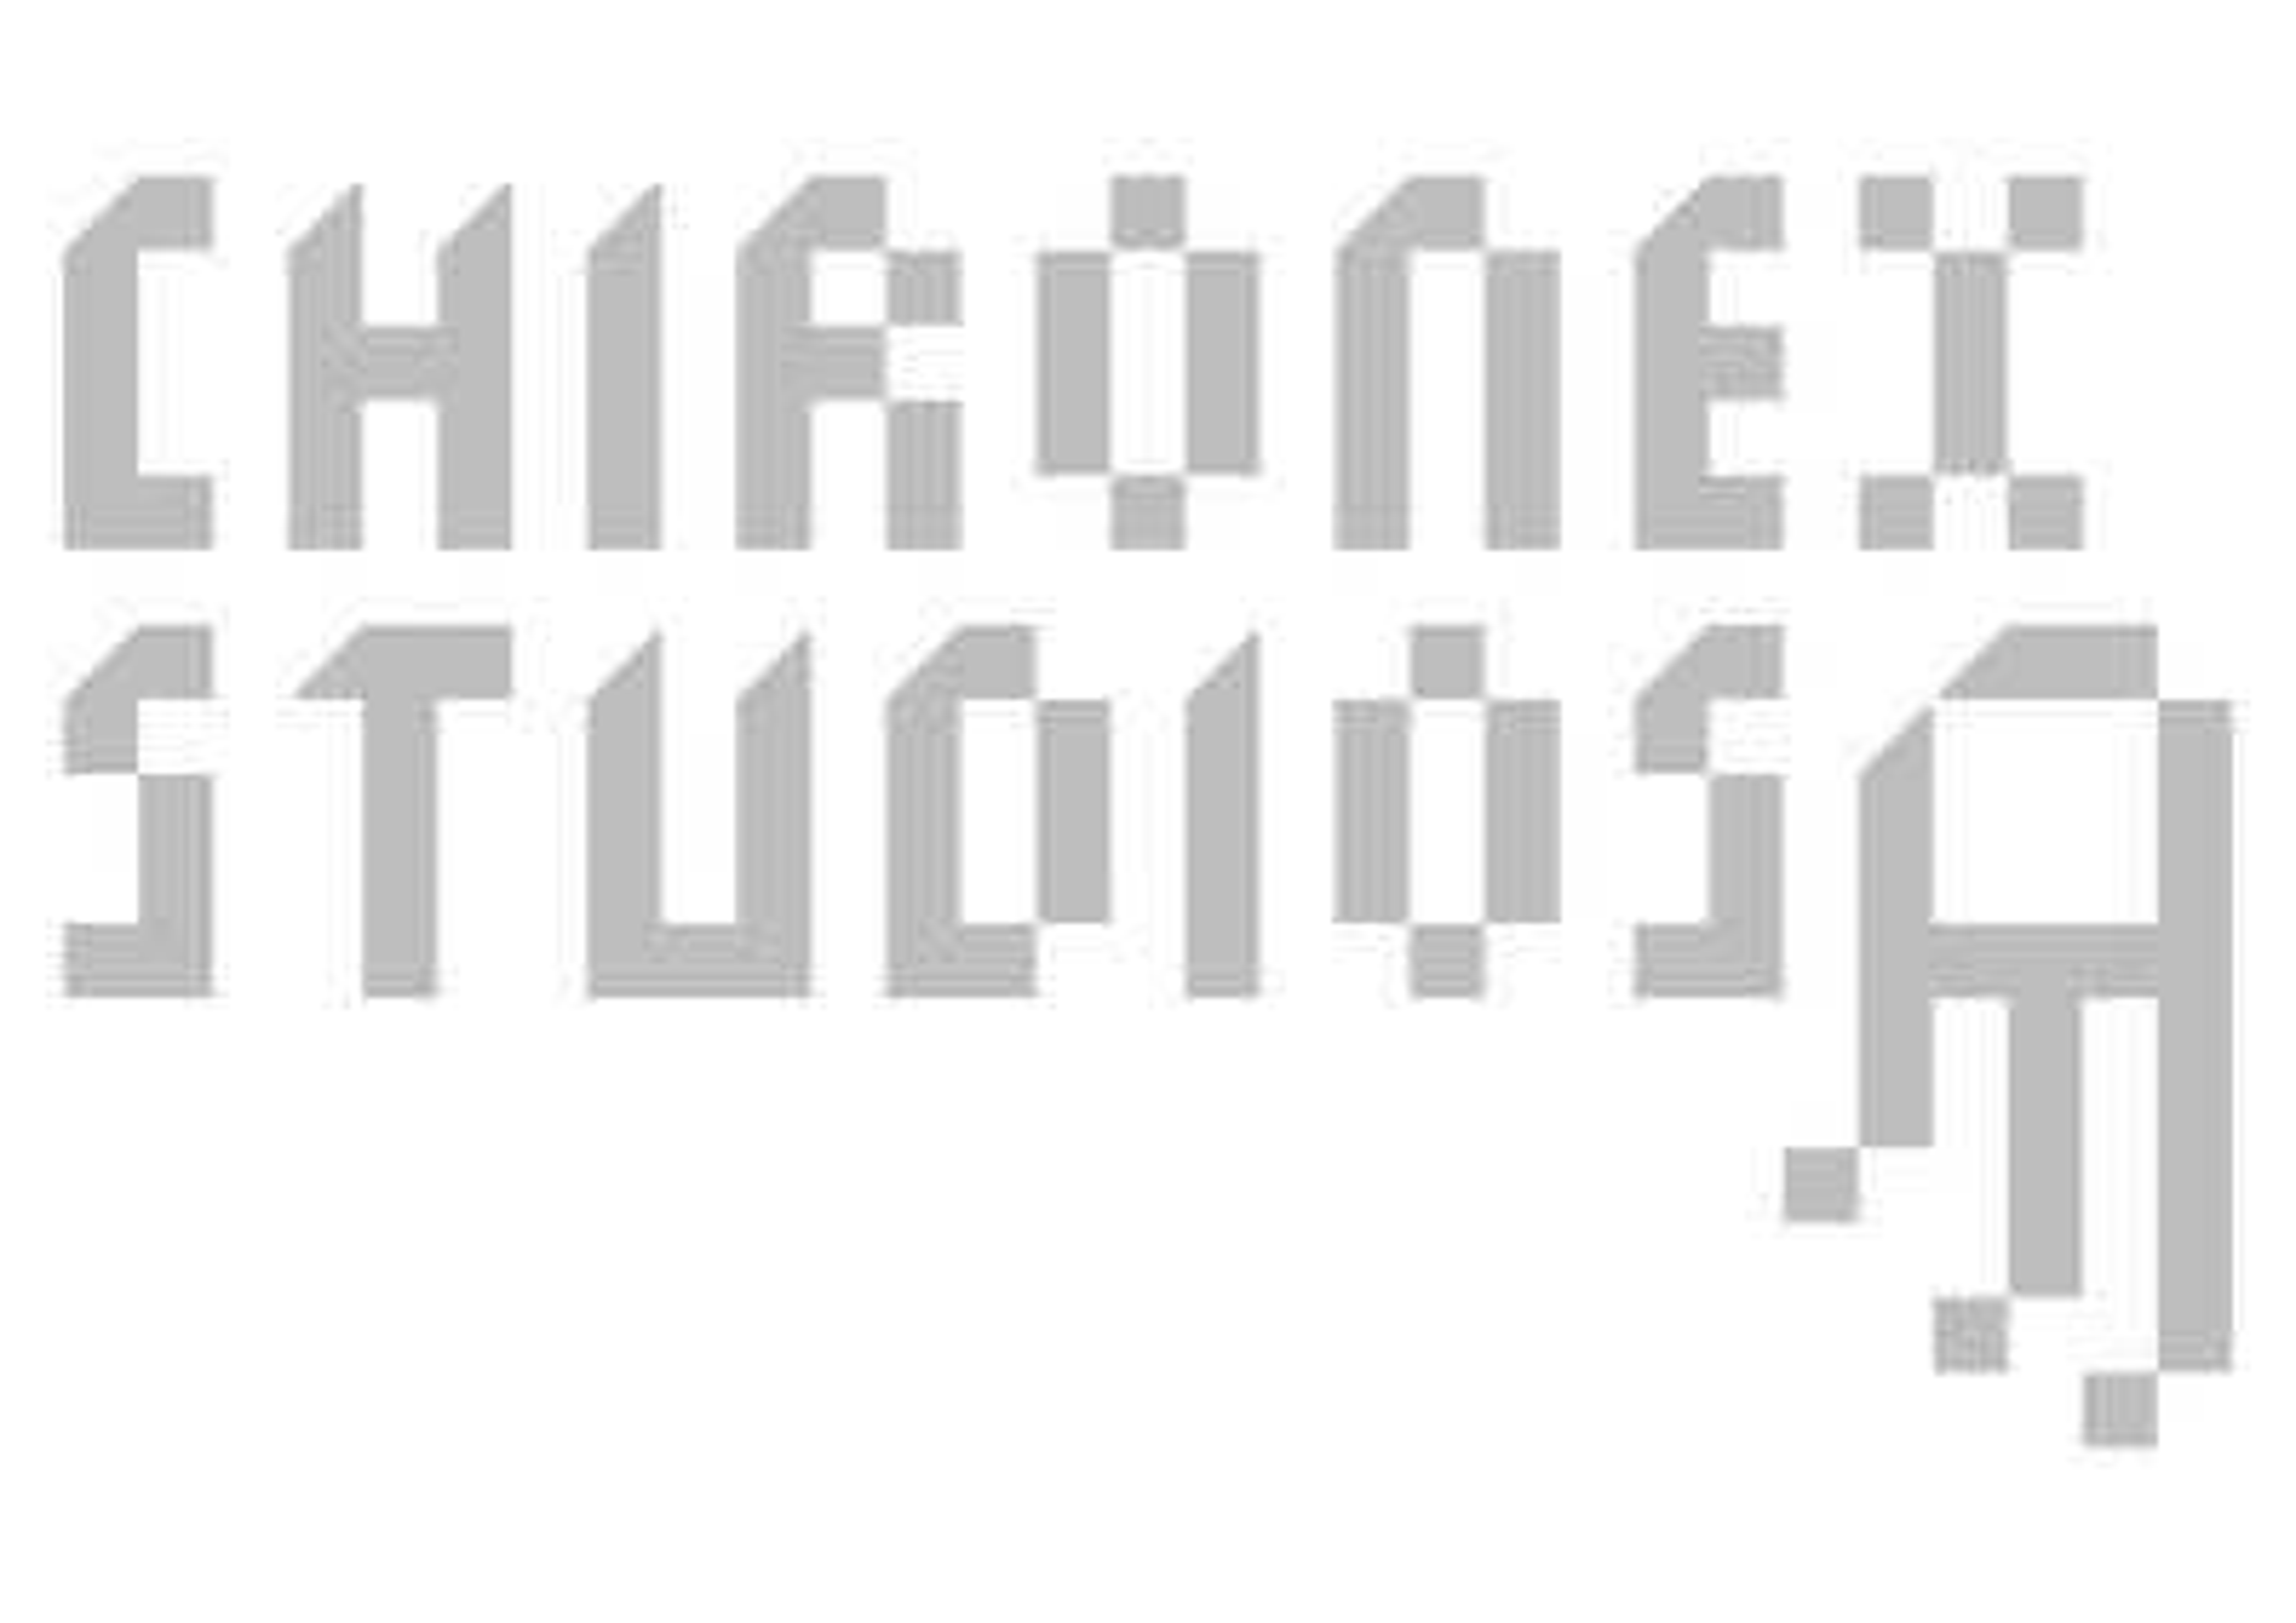 Chironex Studios